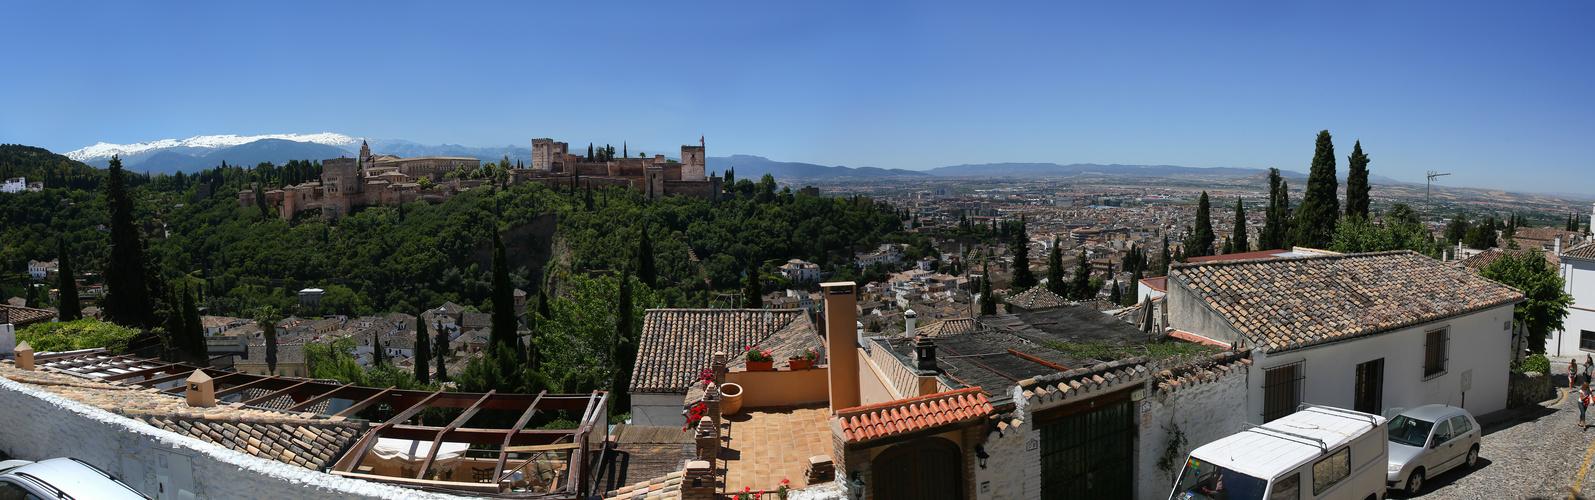 Granada Panorama mit Alhambra